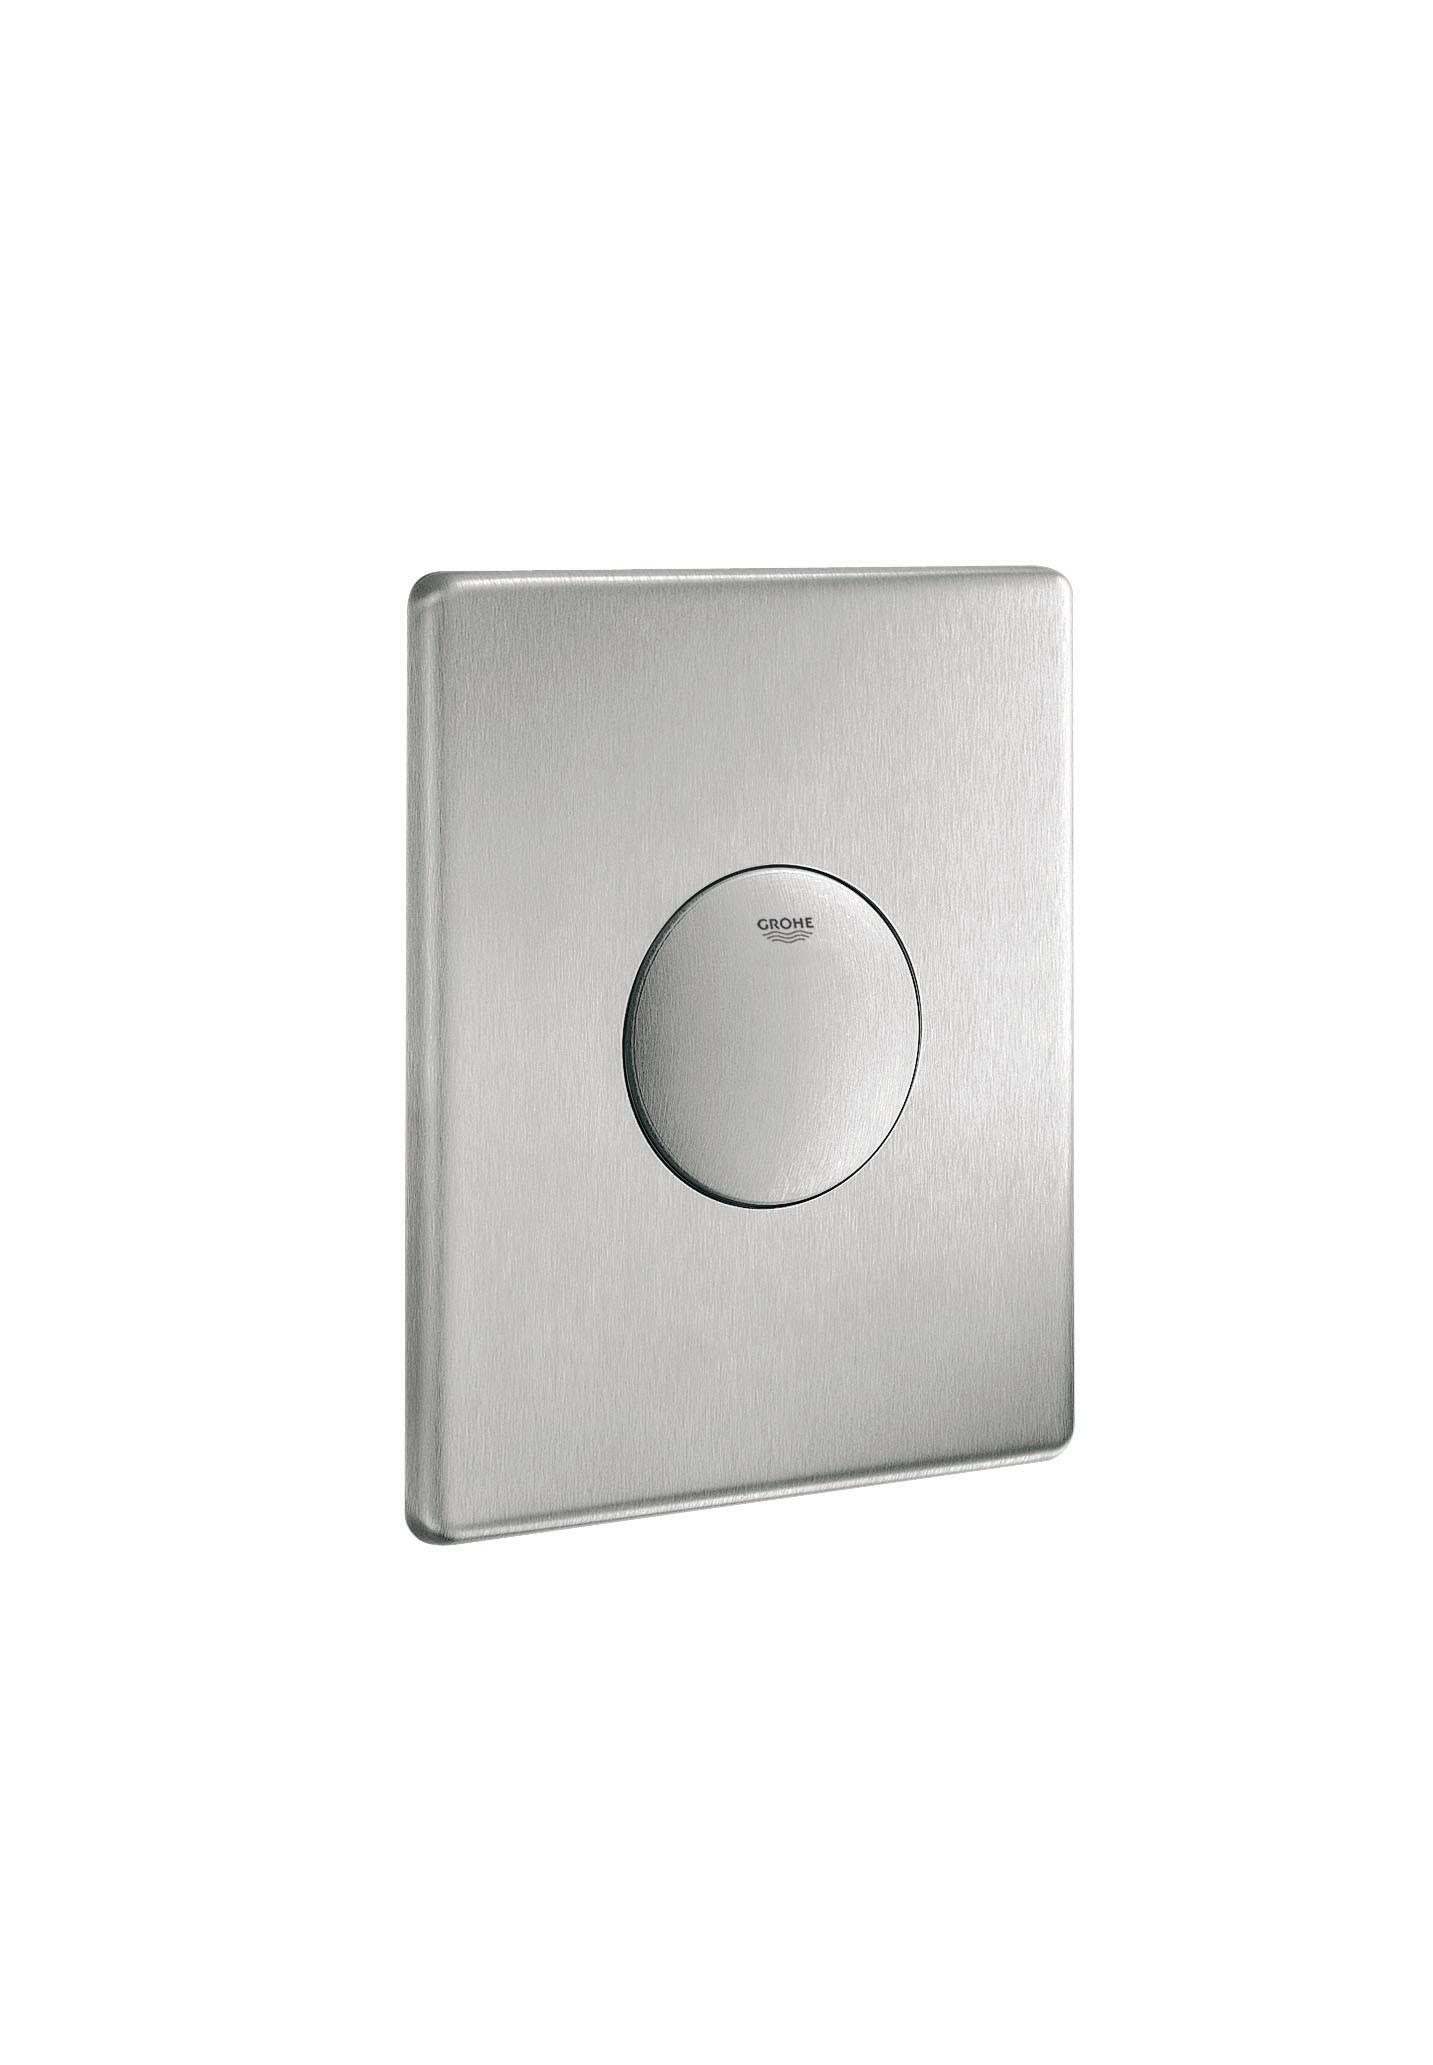 Grohe 38445SD0 Skate (1 режим смыва), нержавеющая сталь (38445SD0)